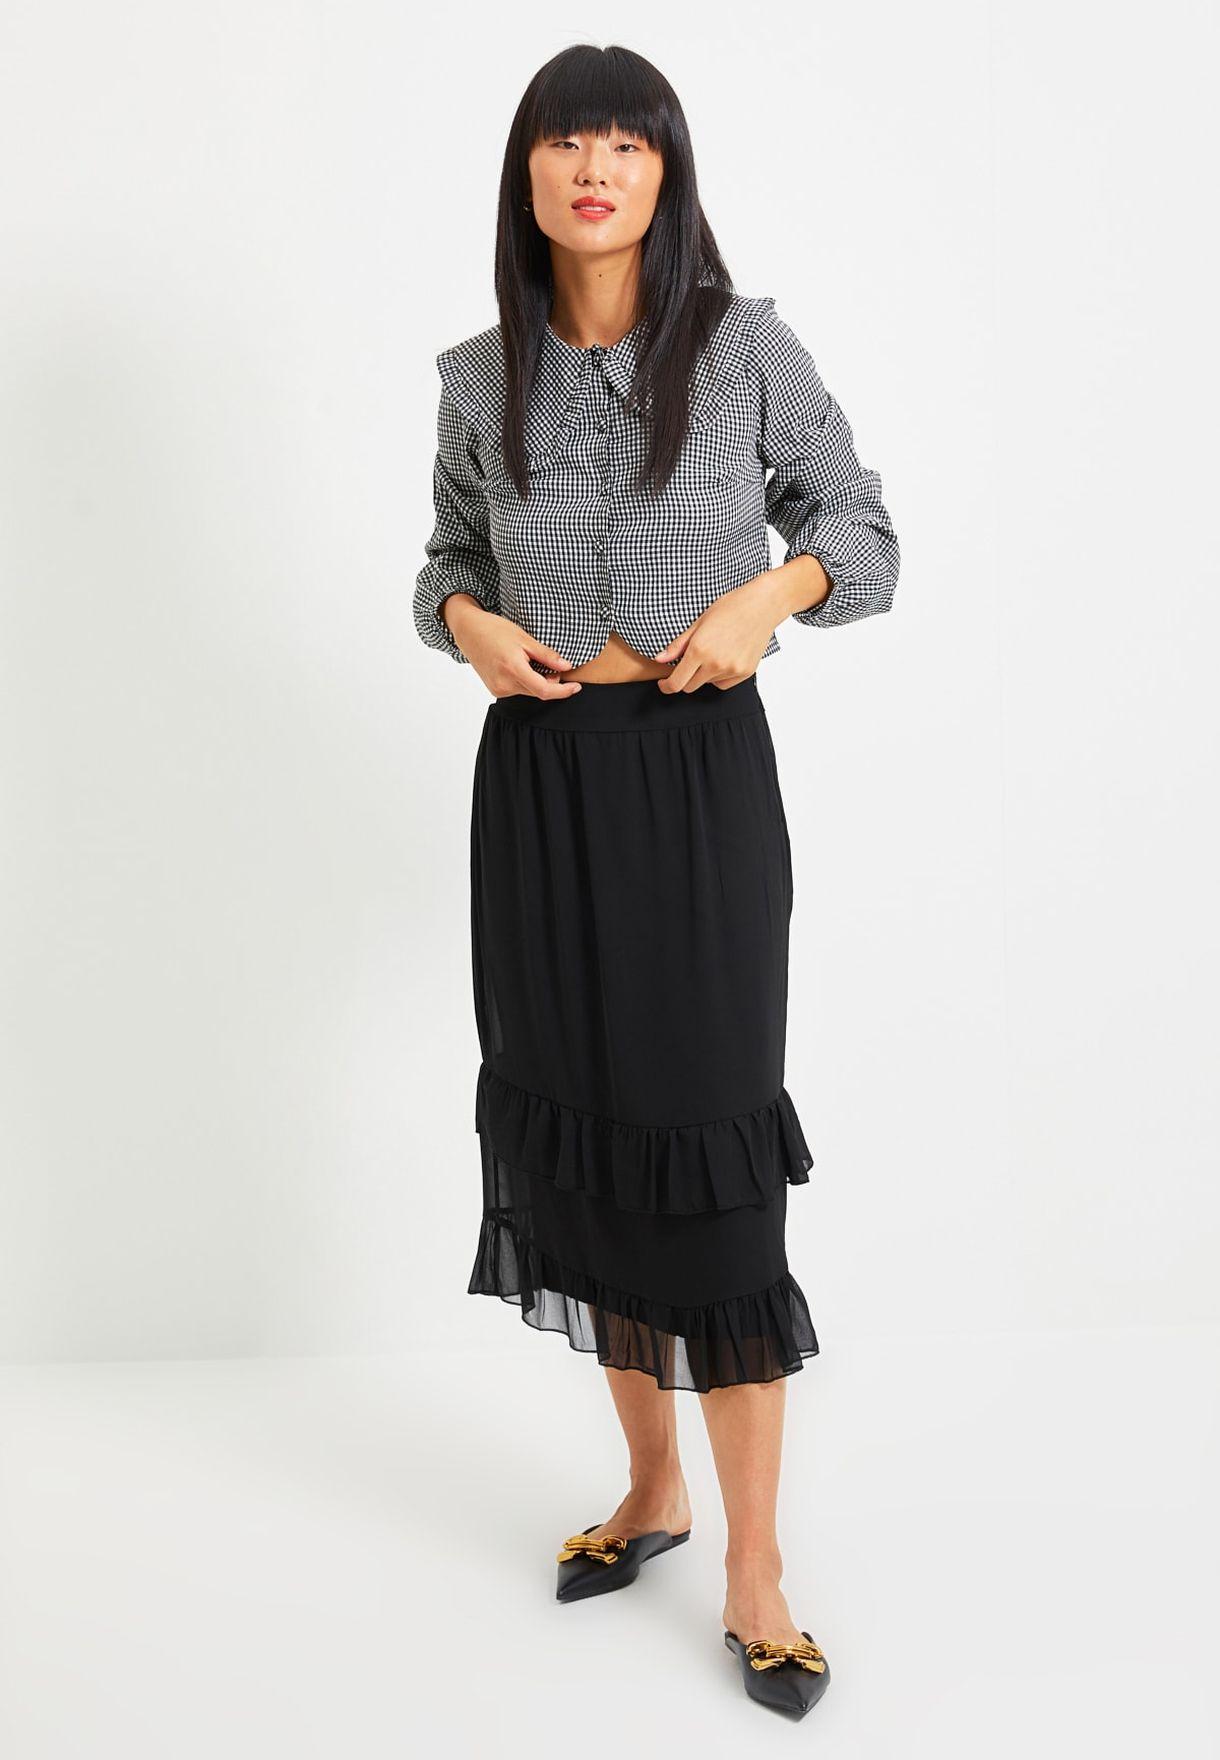 High Waist Tulle Skirt